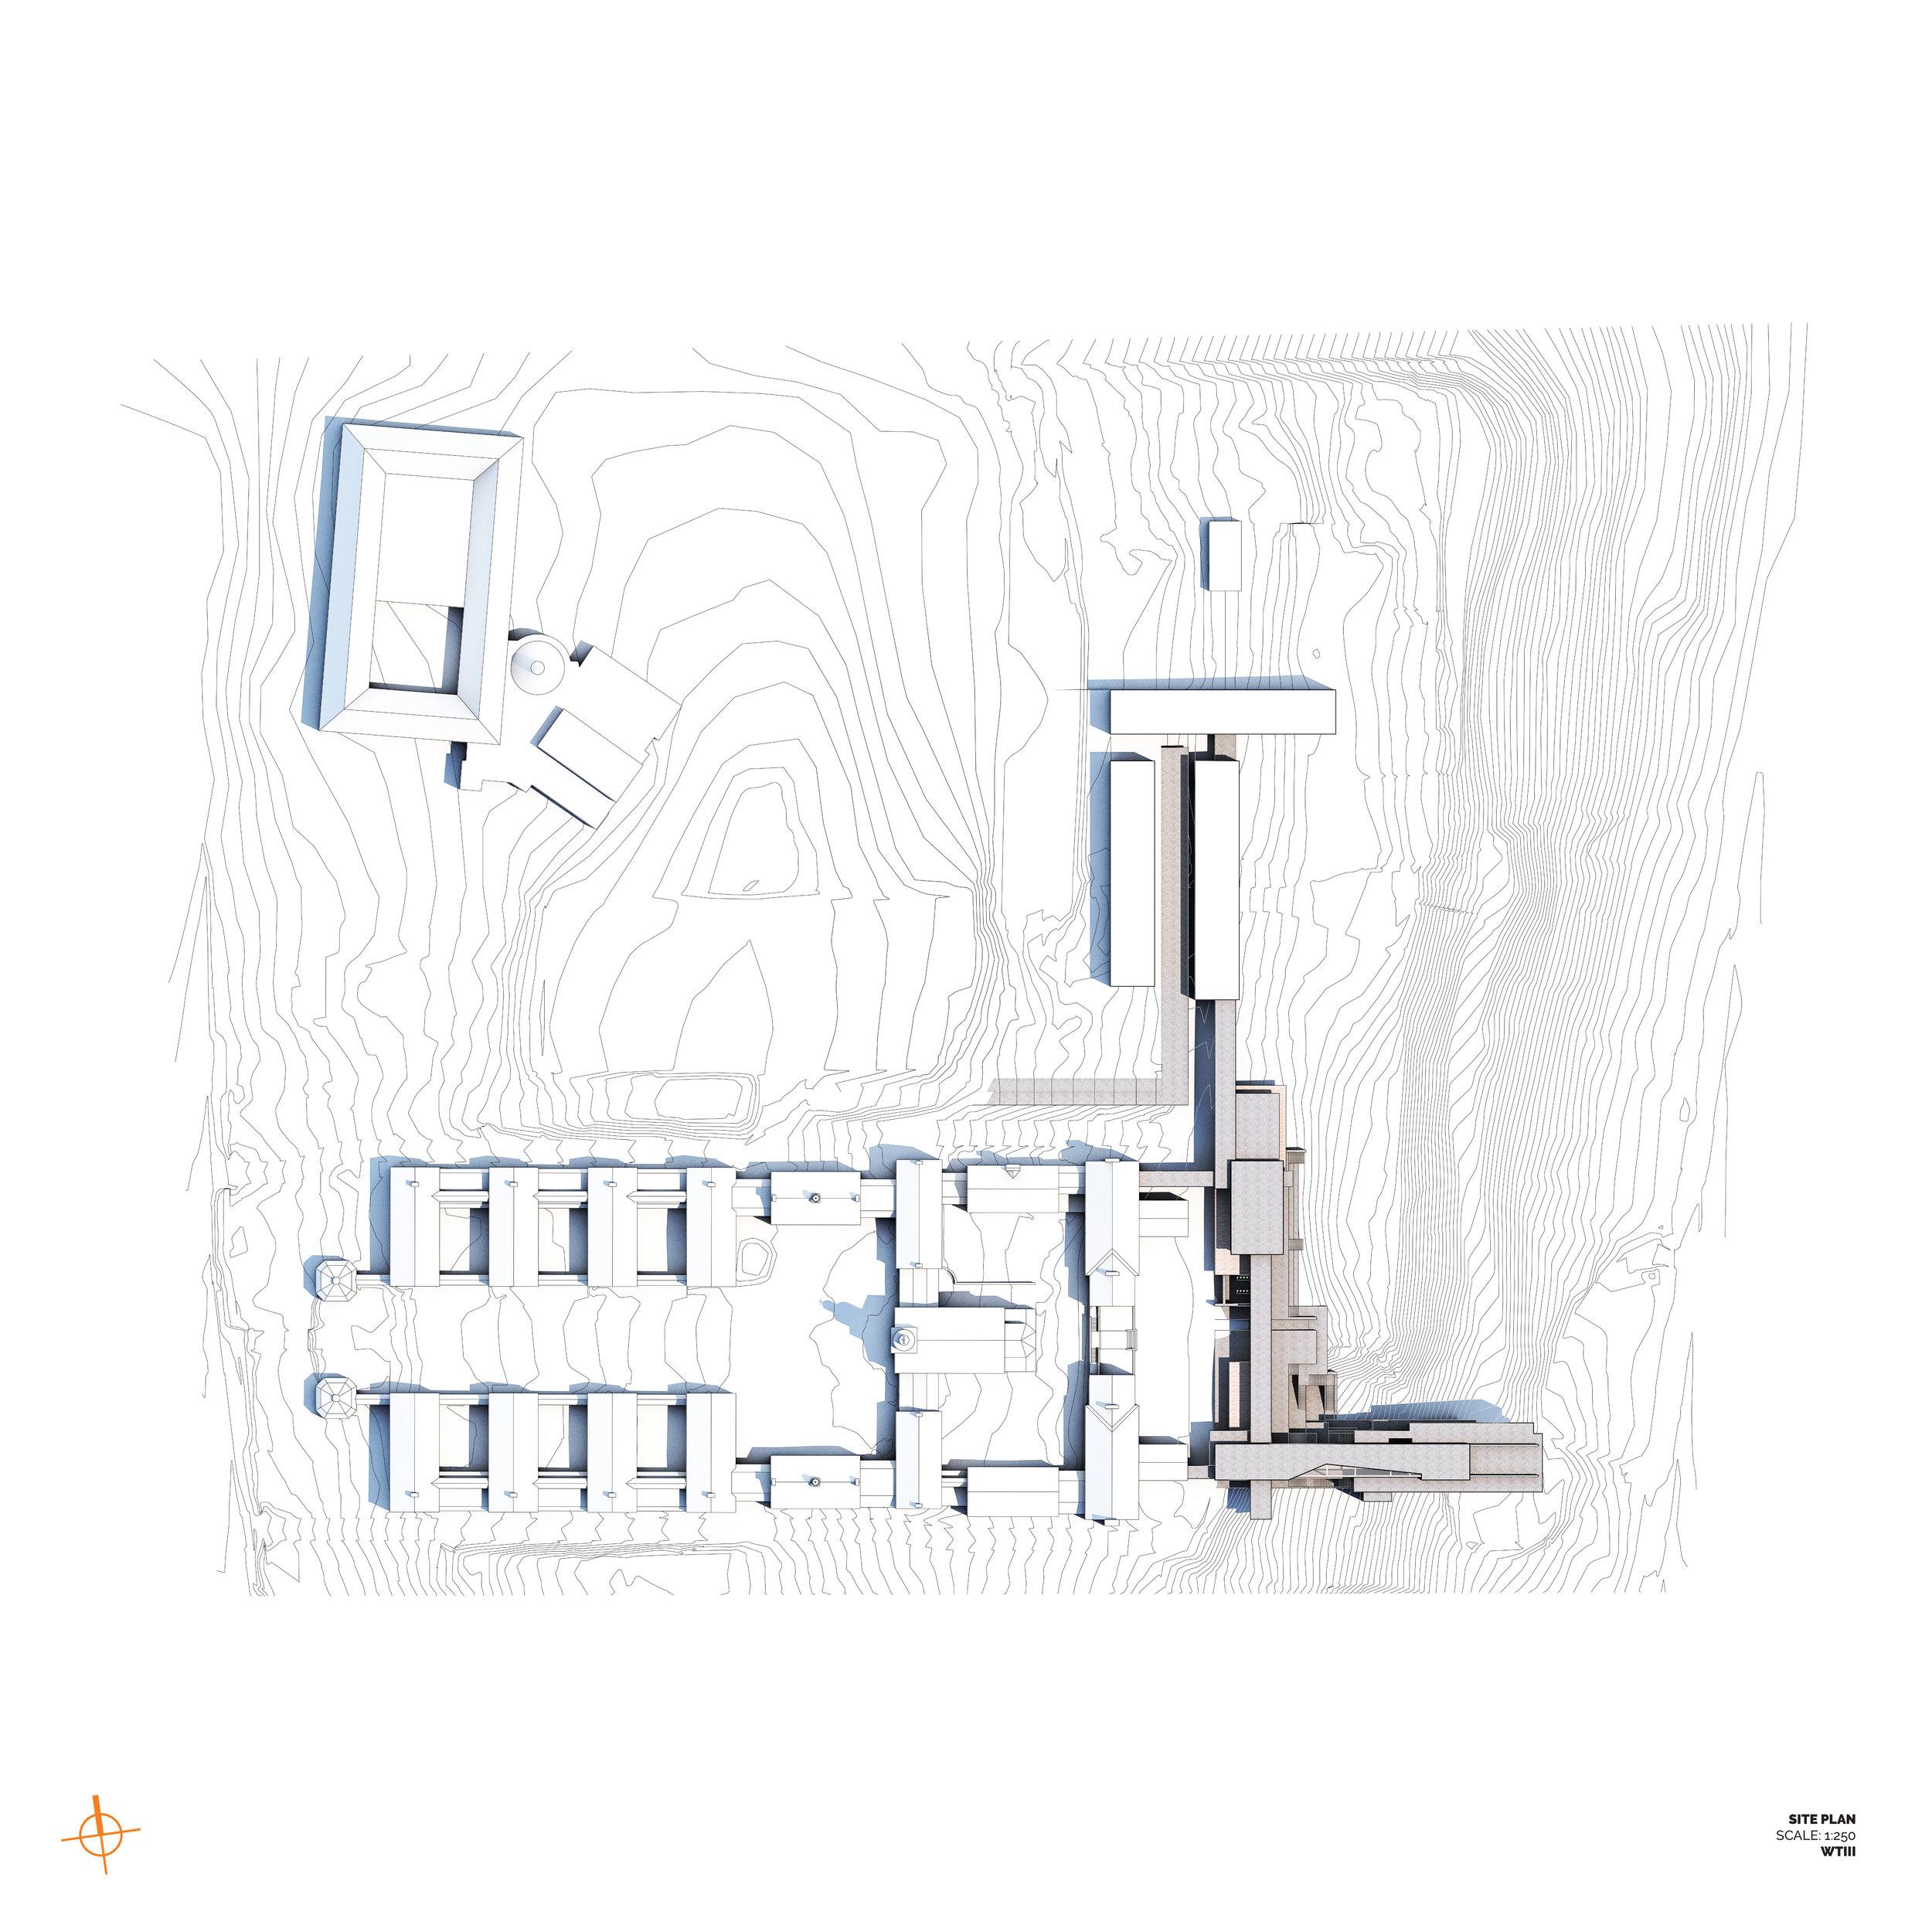 36x36_Site Plan_wtiii.jpg